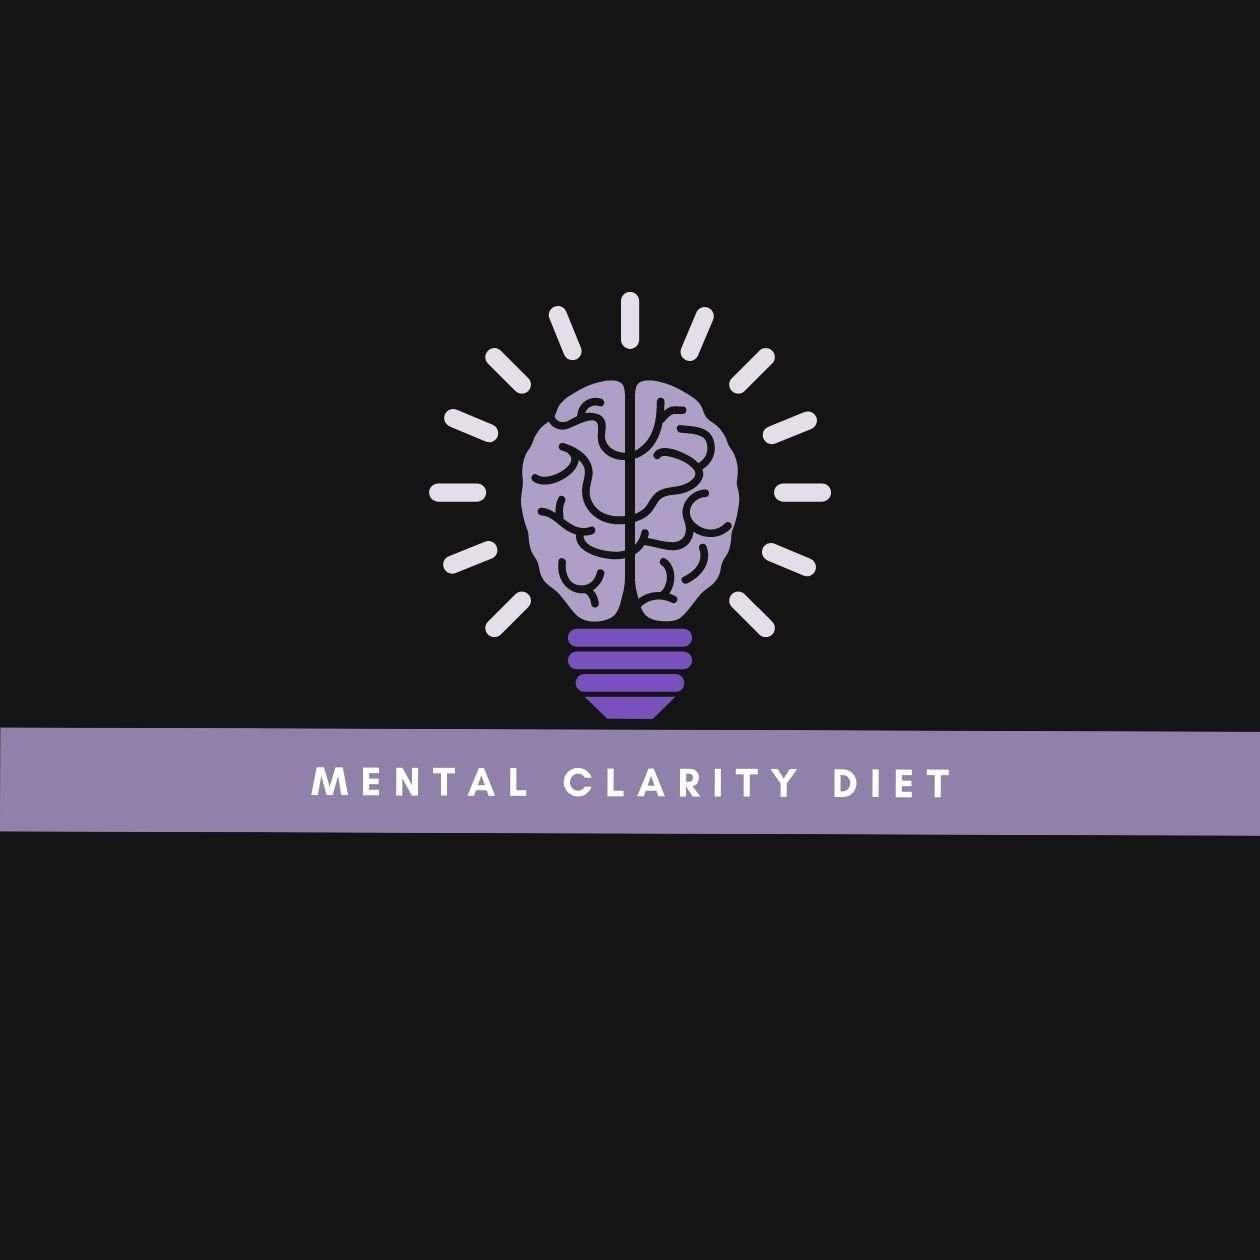 Mental clarity diet: an illustration